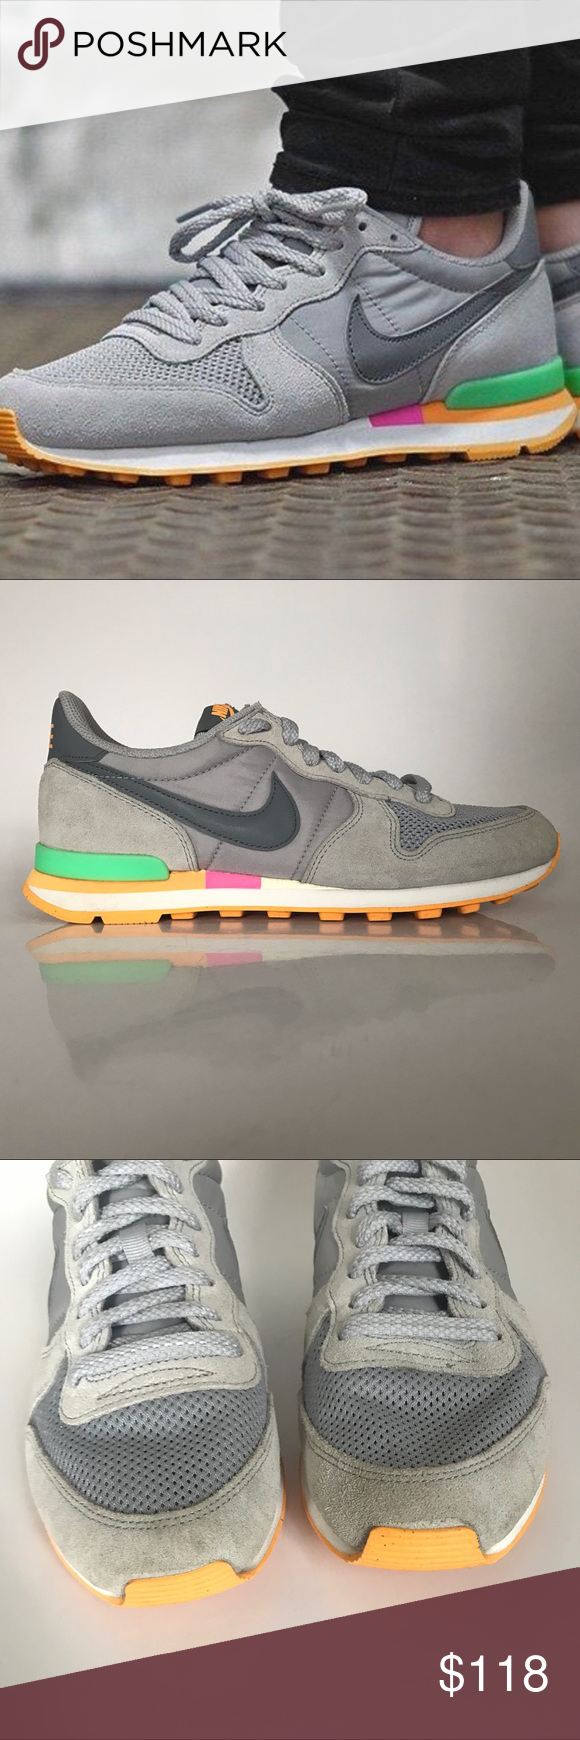 23++ Neon green nike shoes ideas information